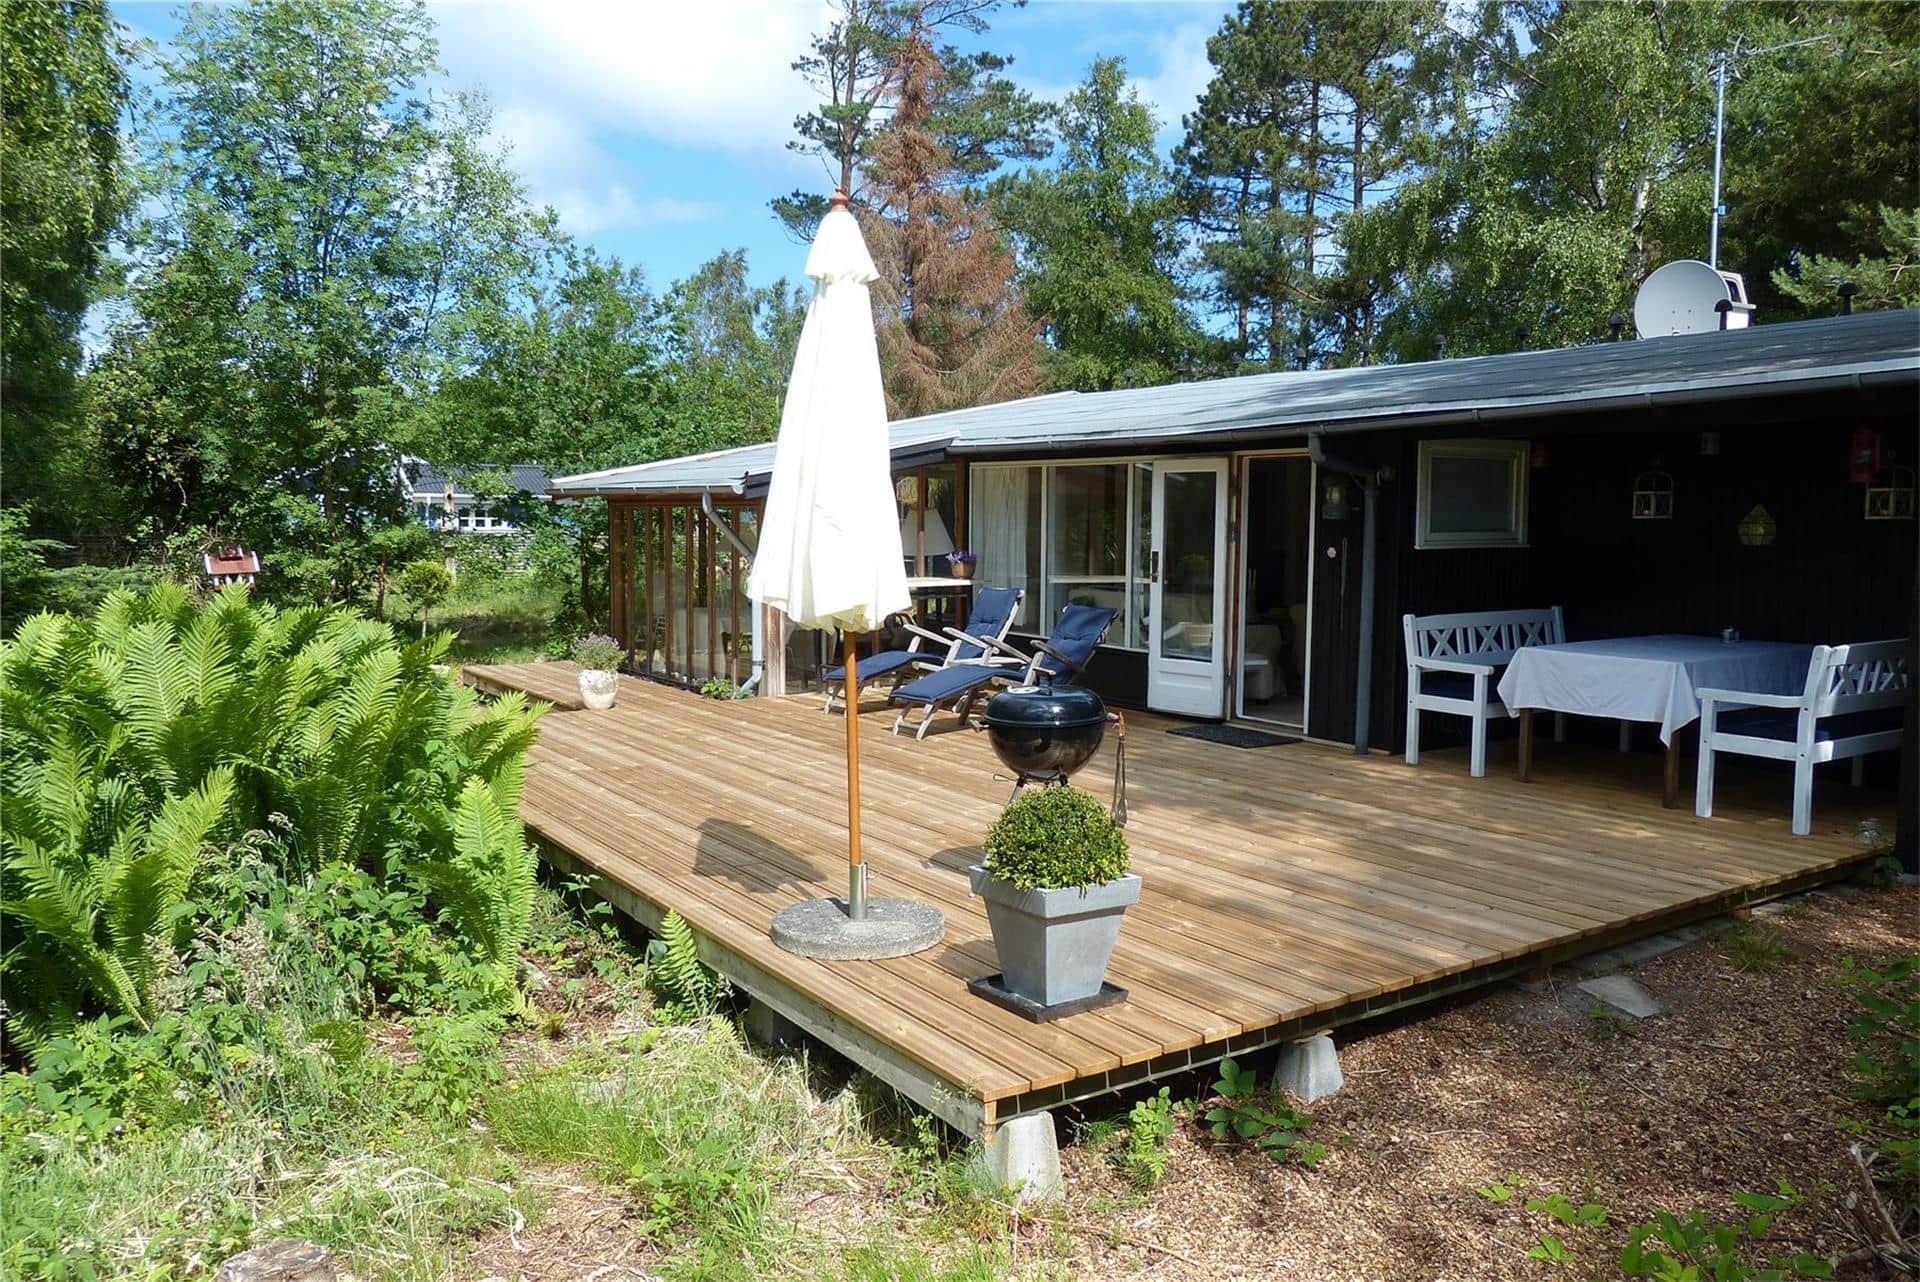 Afbeelding 1-17 Vakantiehuis 13353, Fyrrevænget 6, DK - 4500 Nykøbing Sj